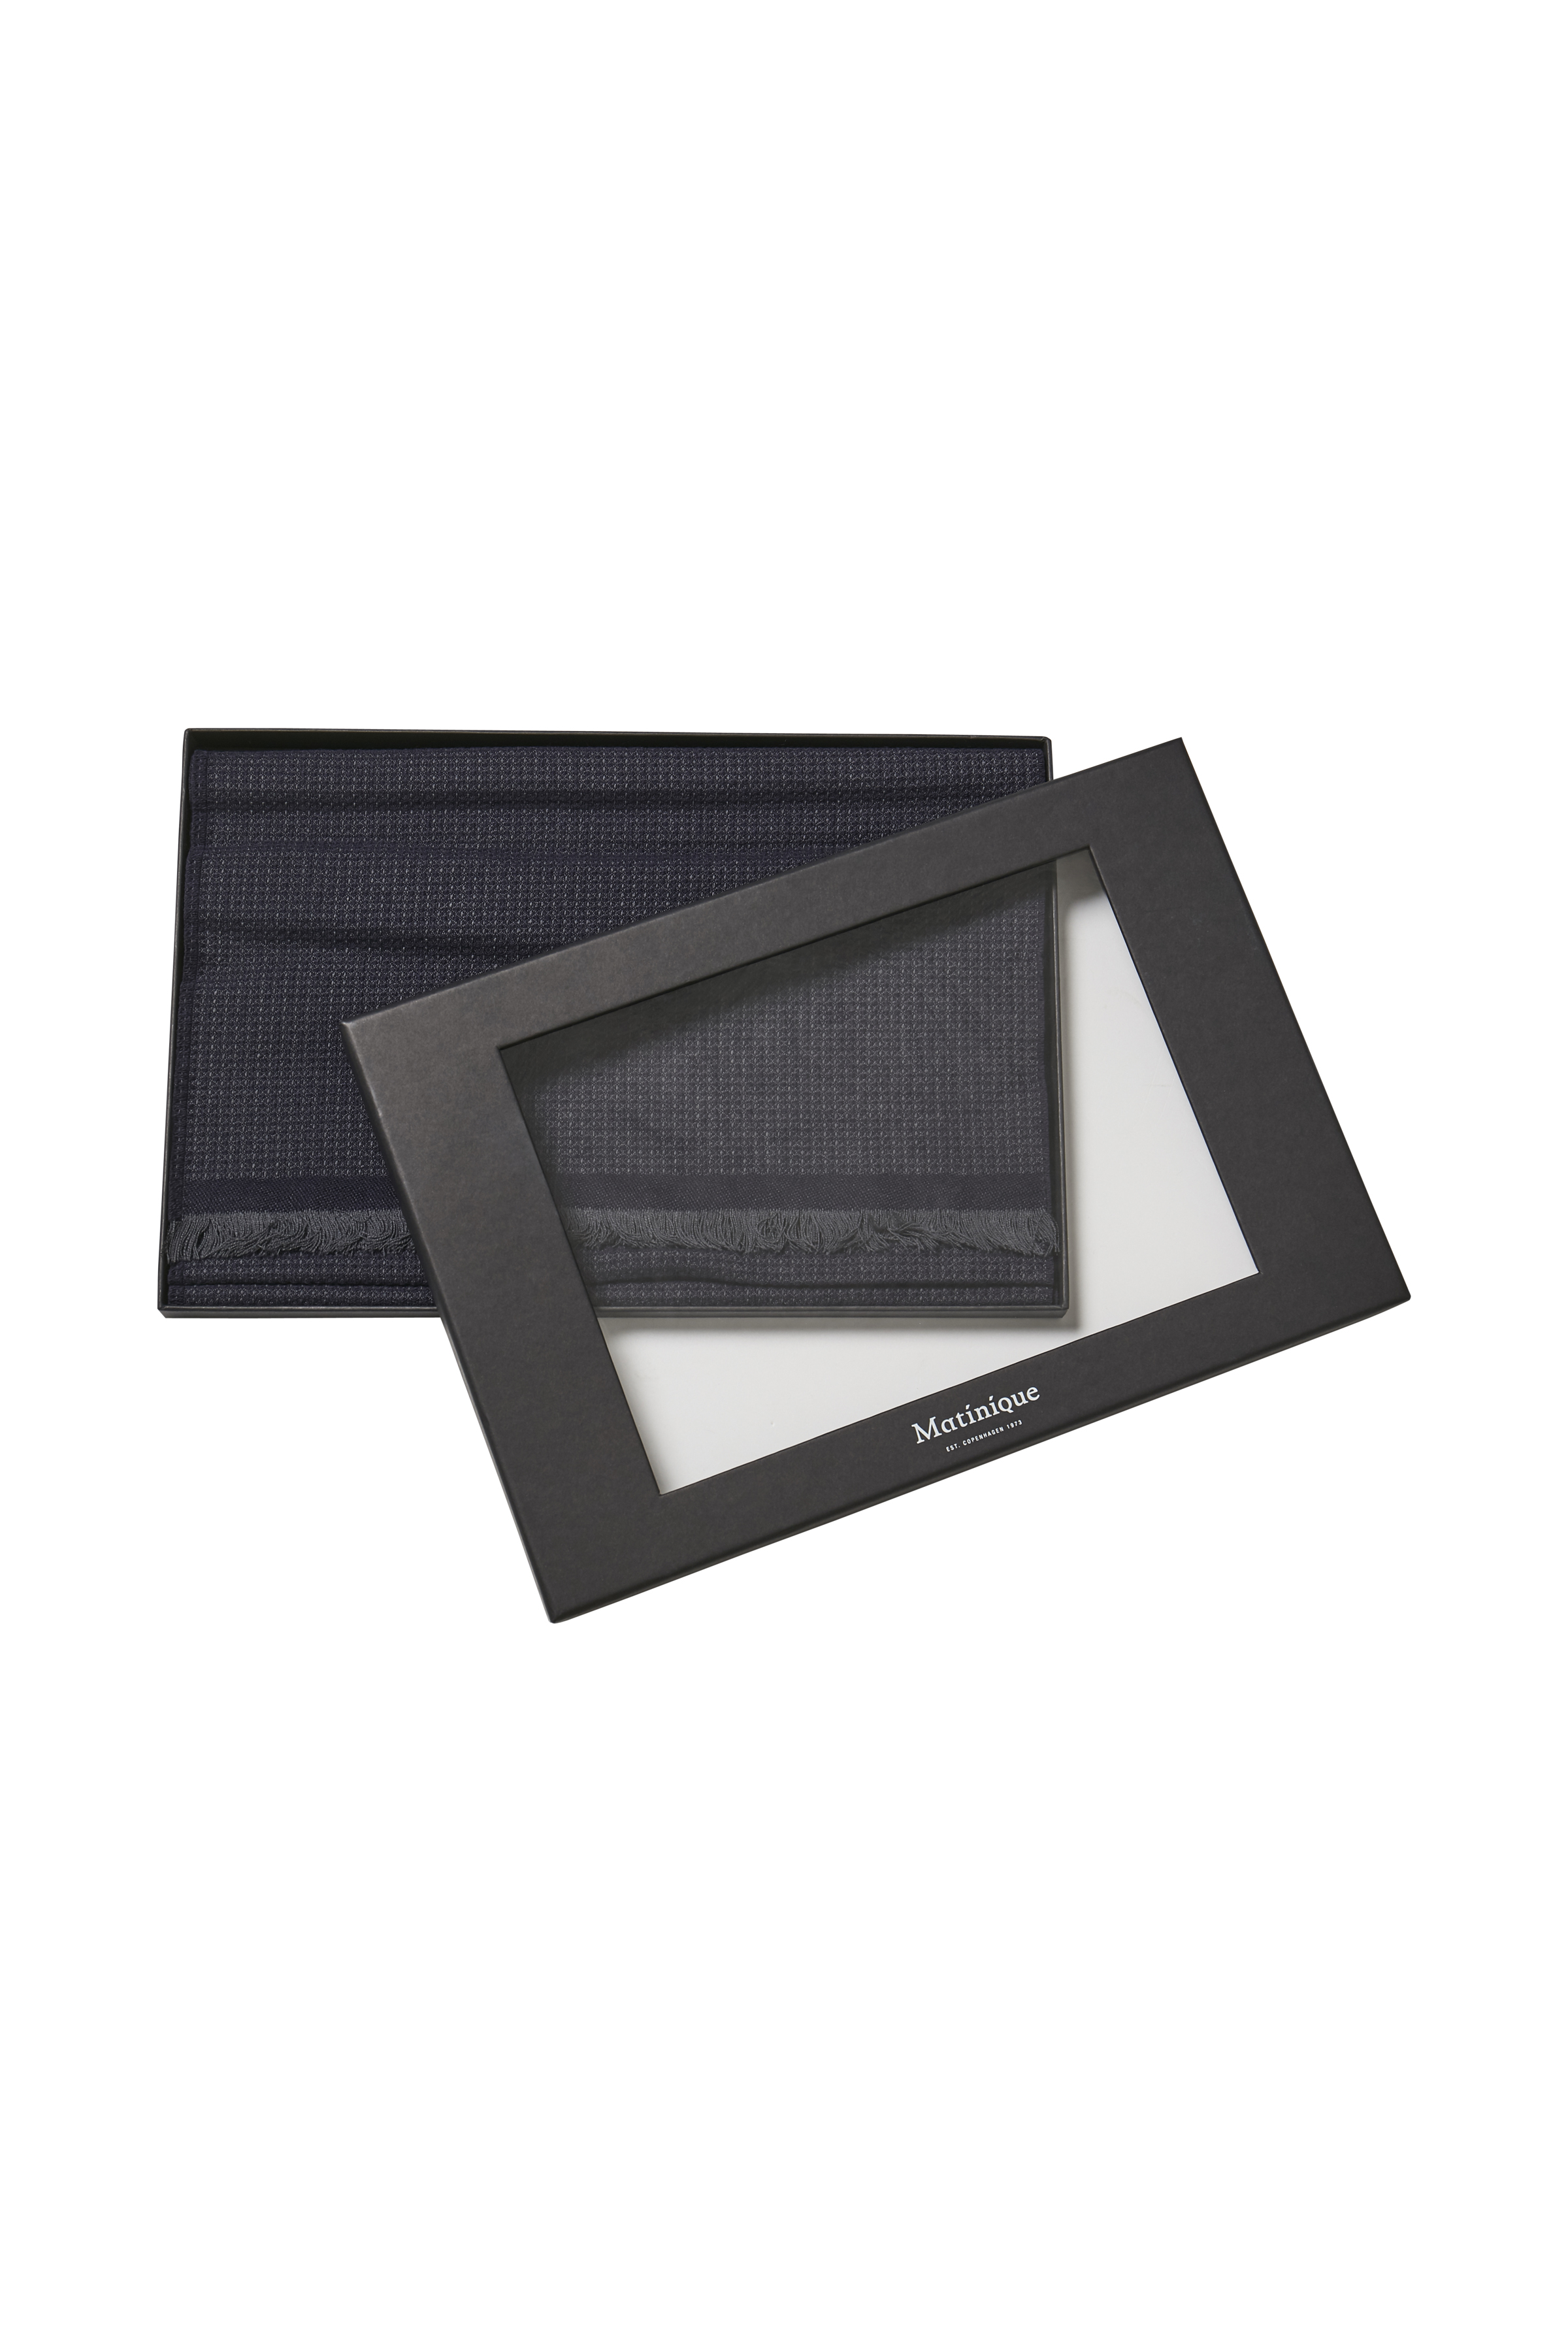 Dark Navy Aydon Tørklæde – Køb Dark Navy Aydon Tørklæde fra str. ONE her